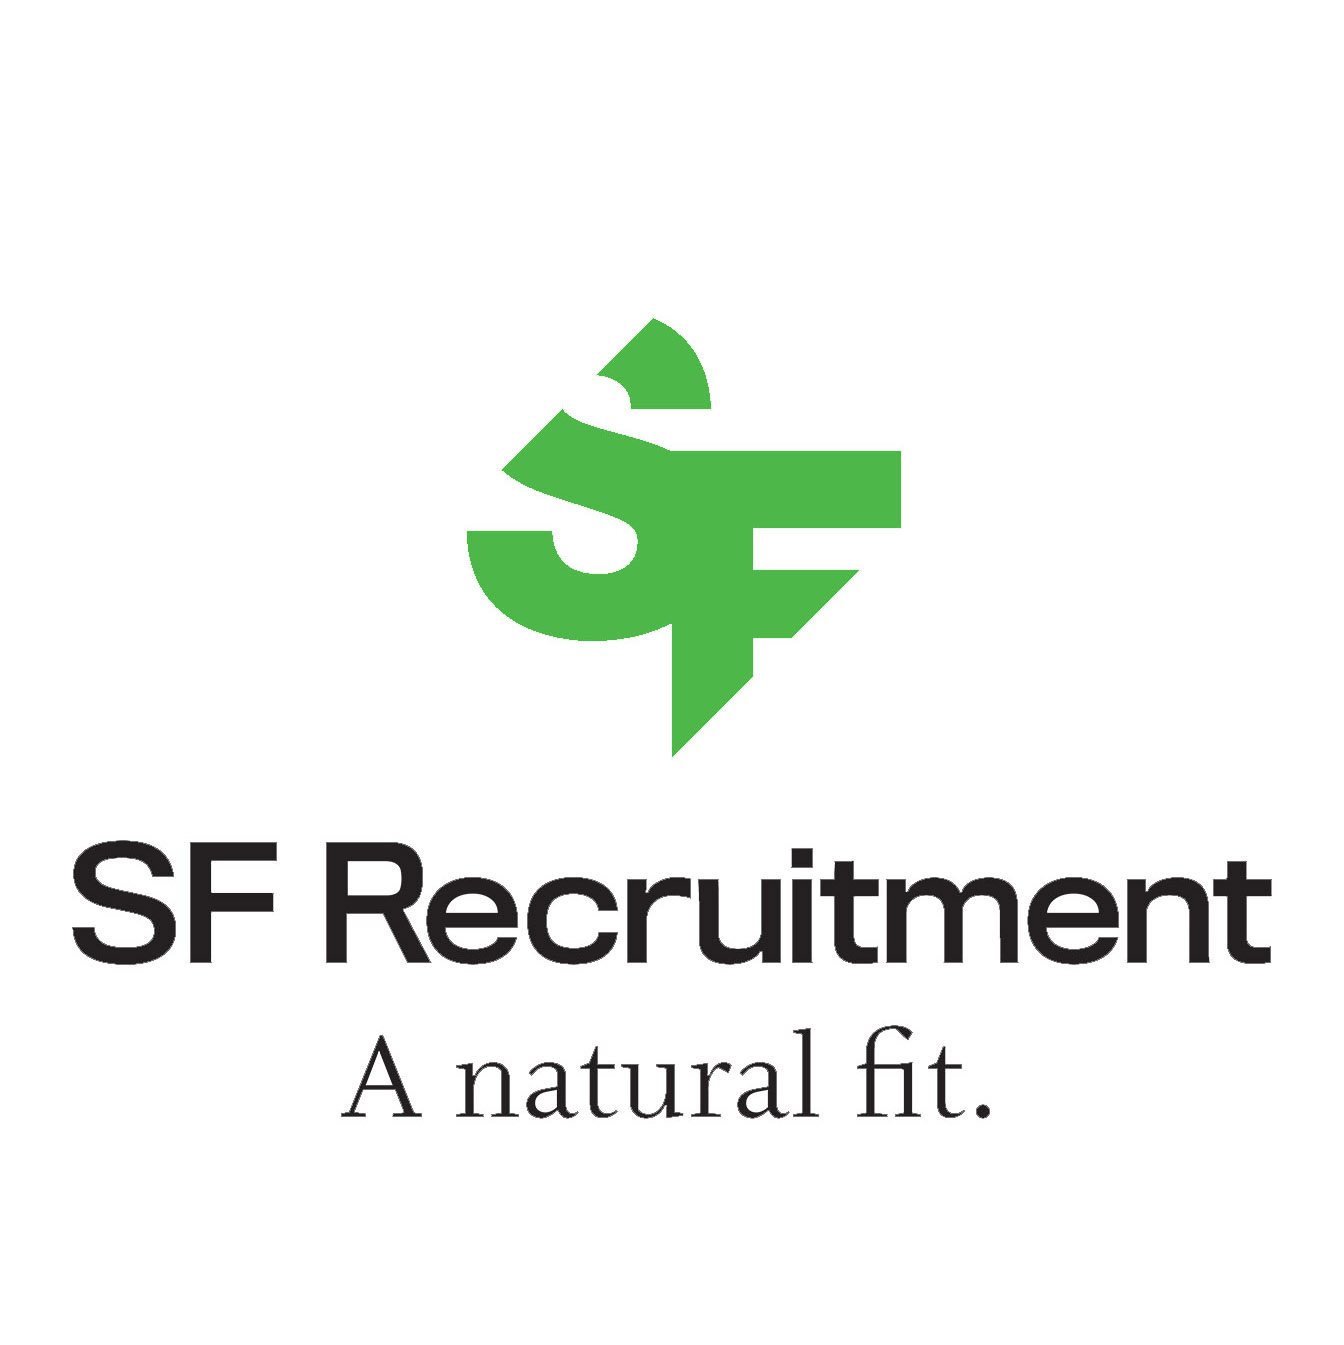 SF Recruitment logo